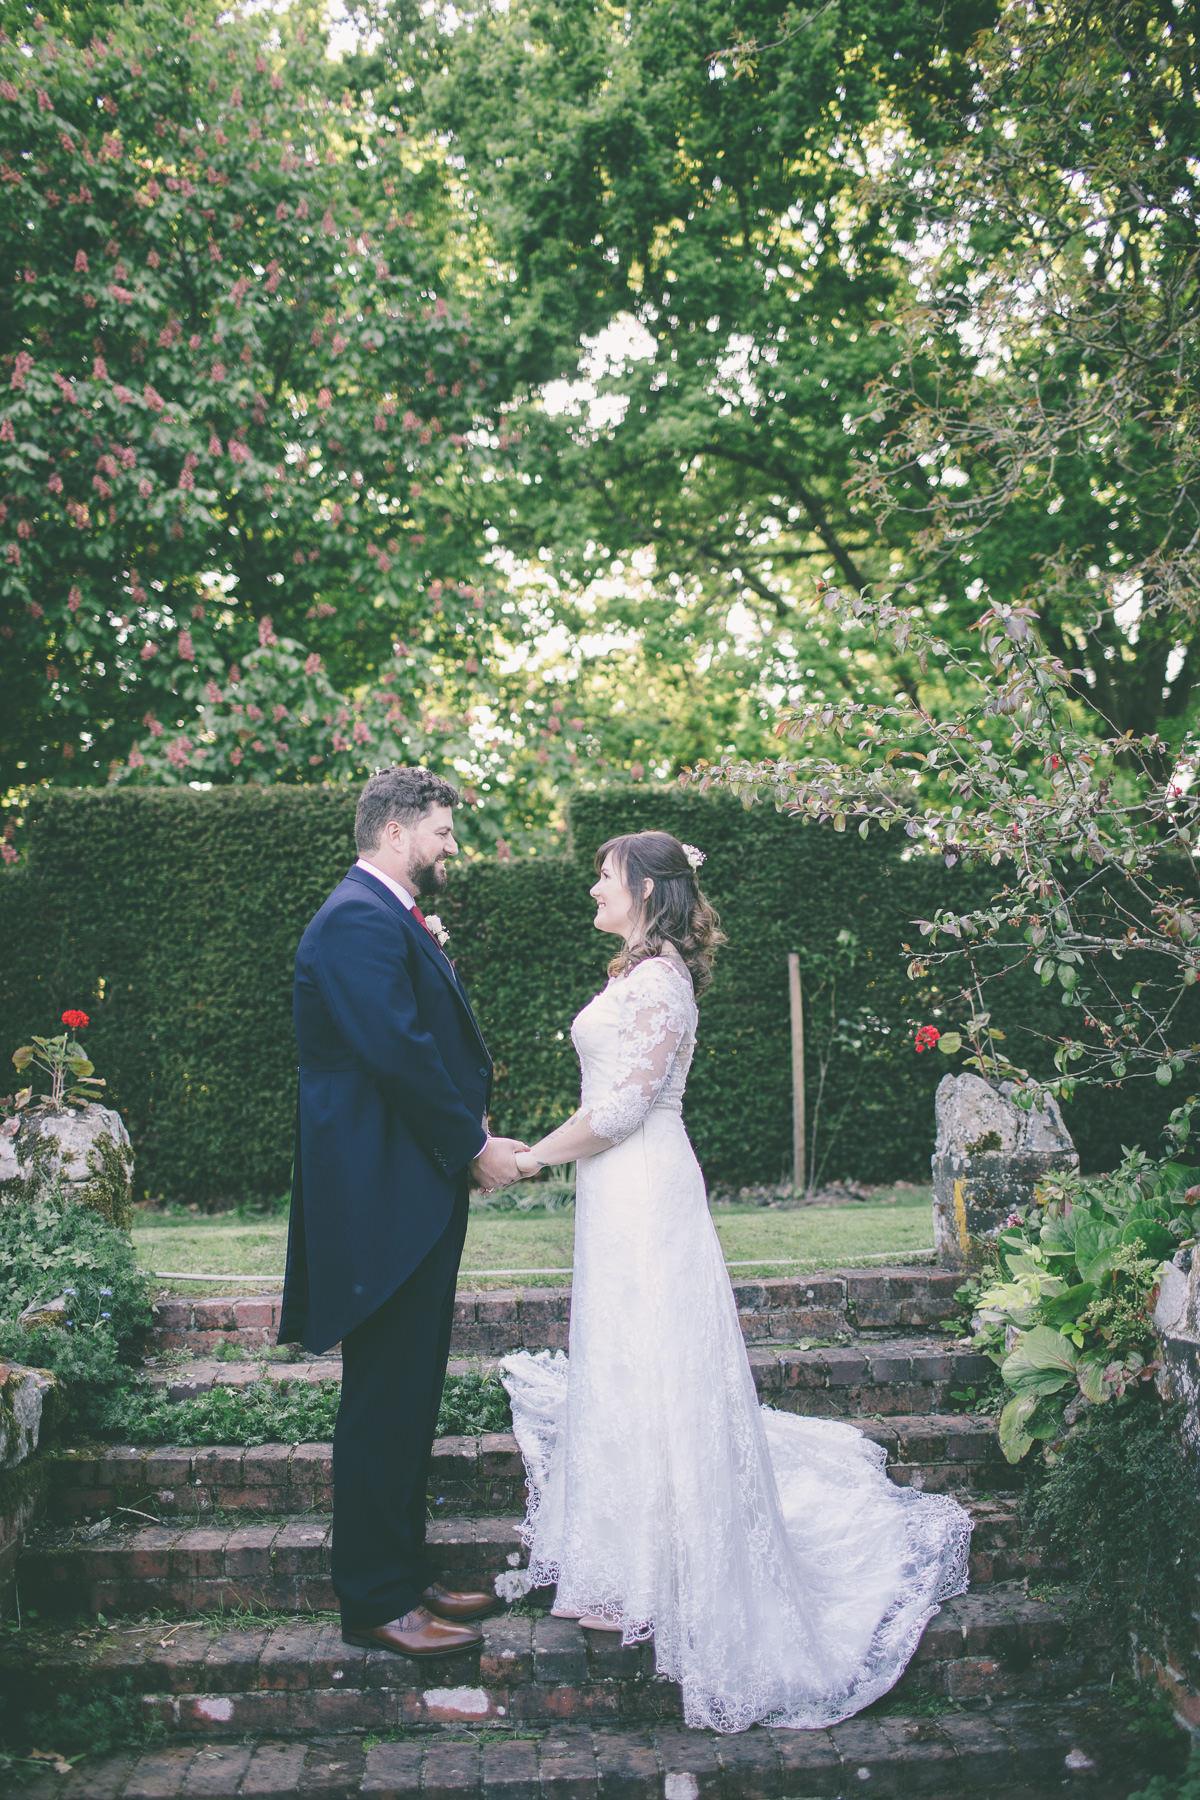 Pamber-Place-wedding-photography-basingstoke-hampshire-192